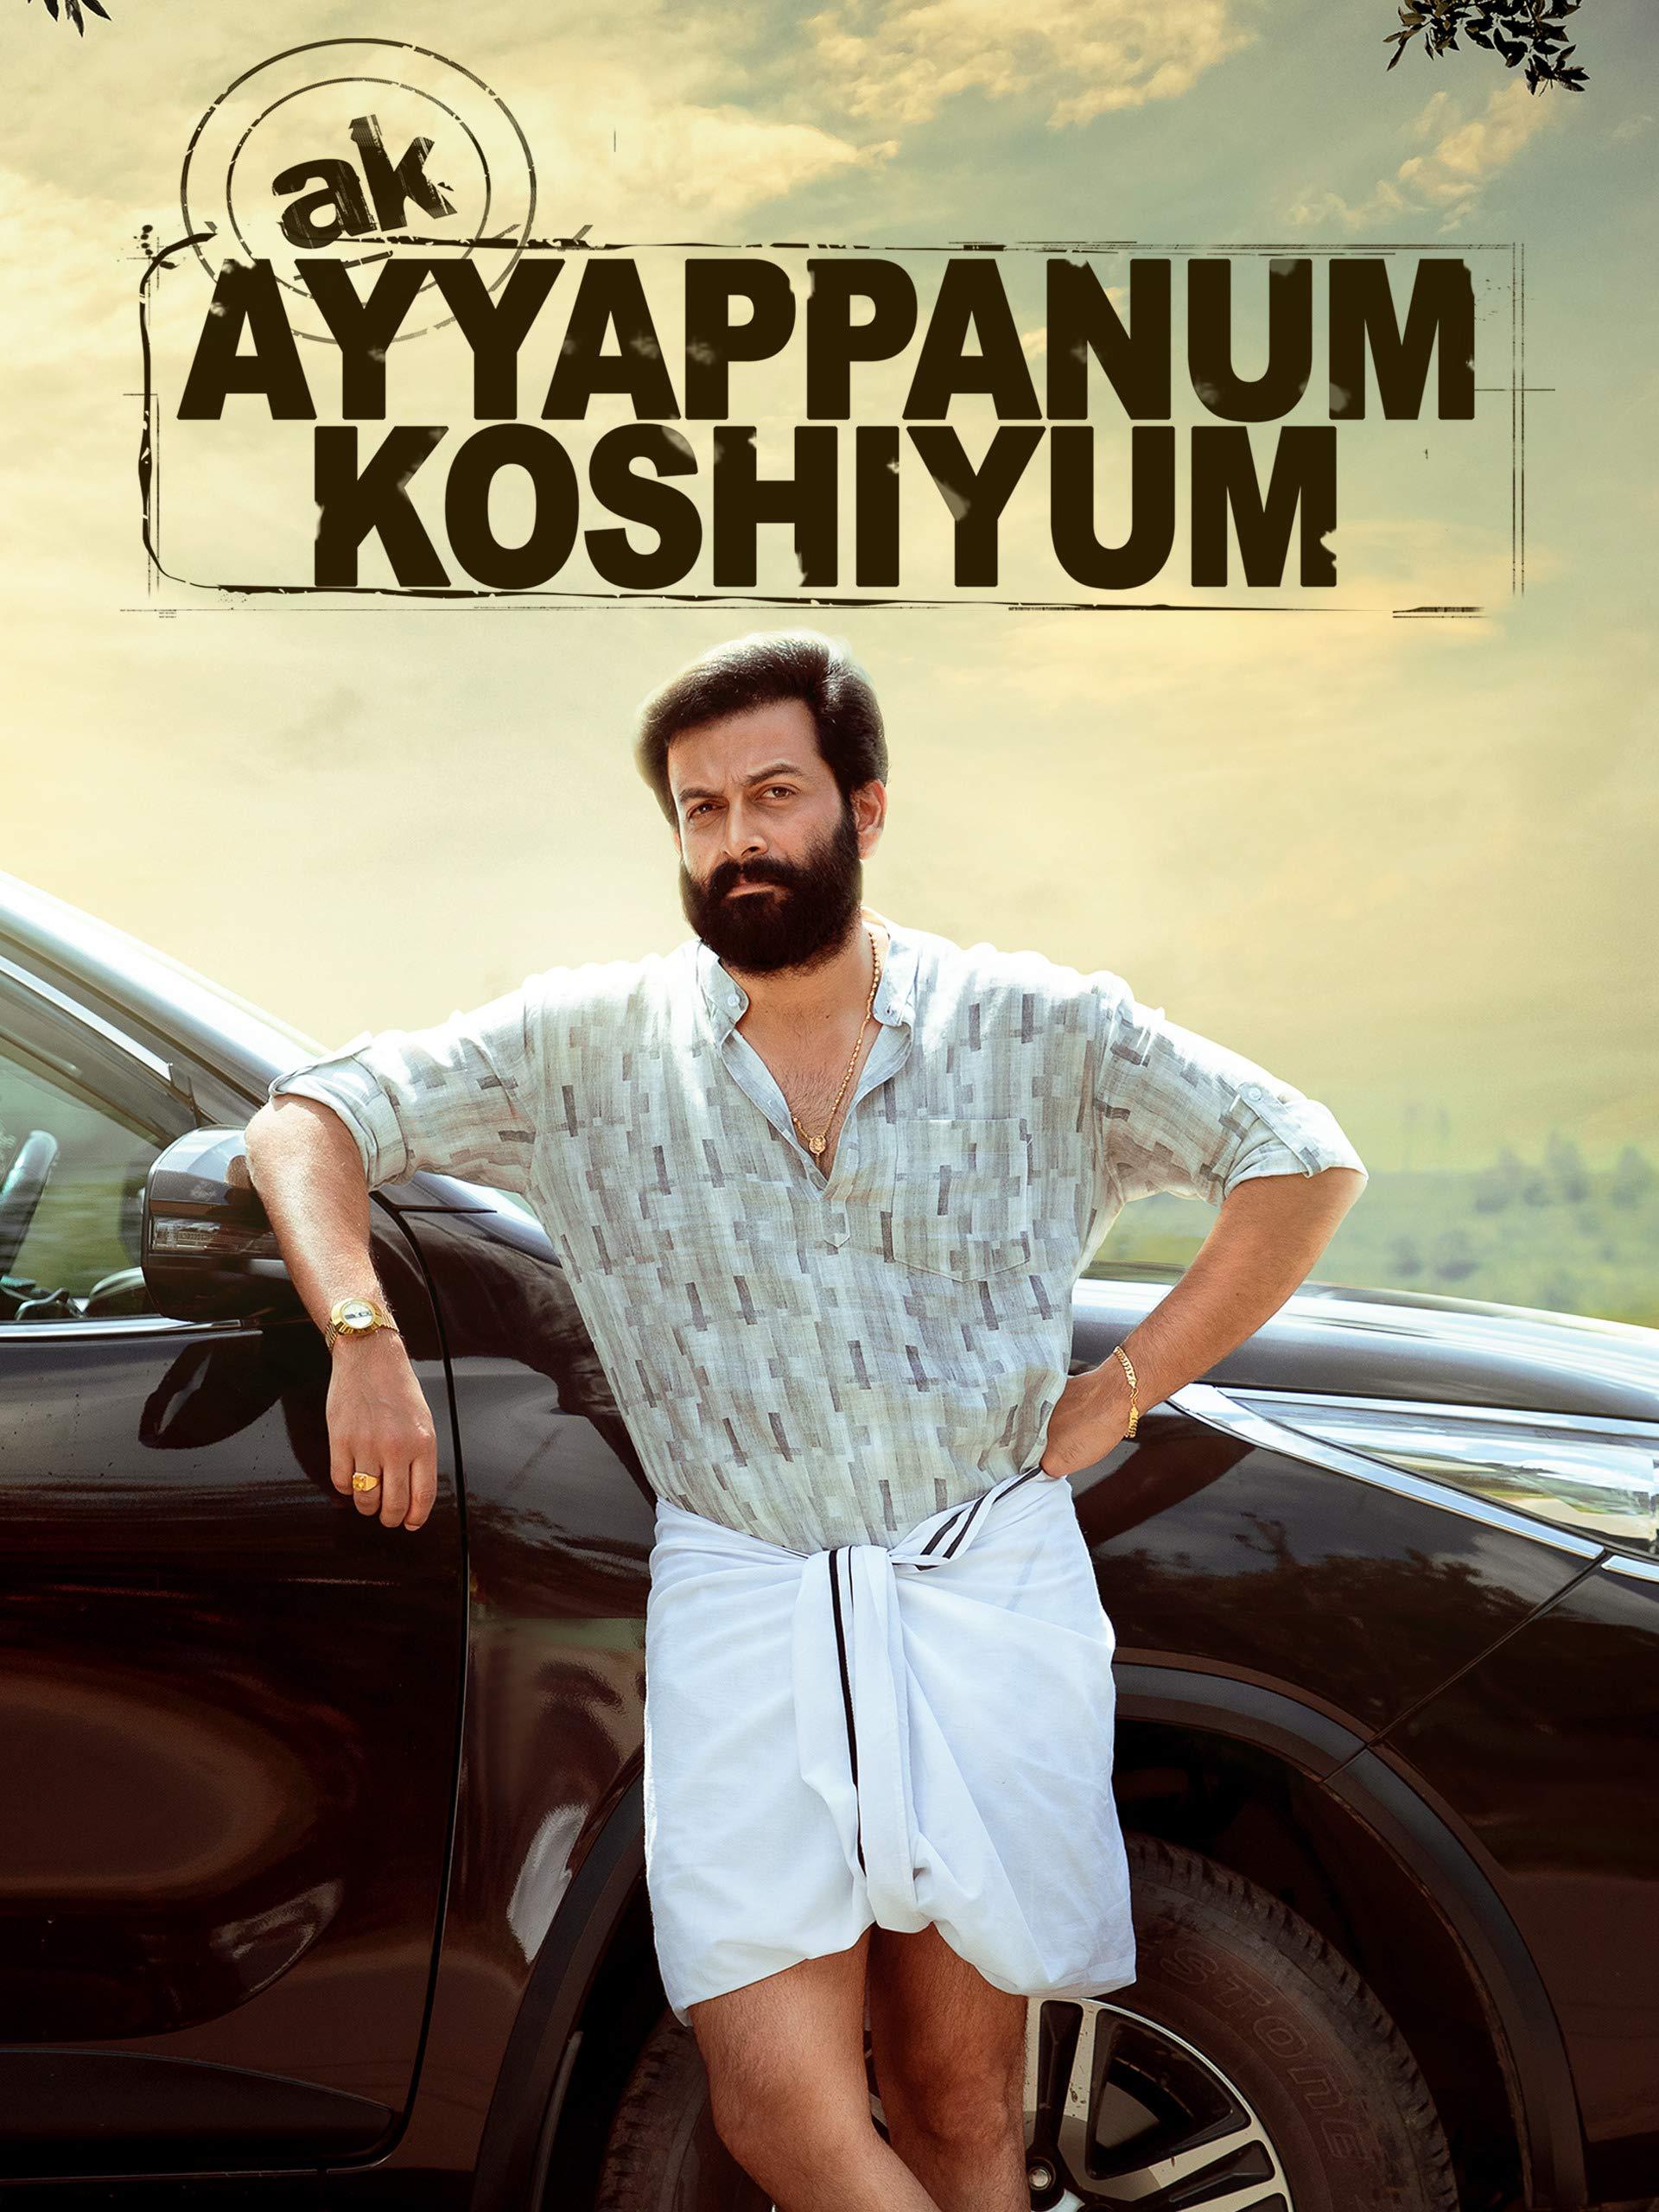 Watch AK Ayyappanum Koshiyum | Prime Video